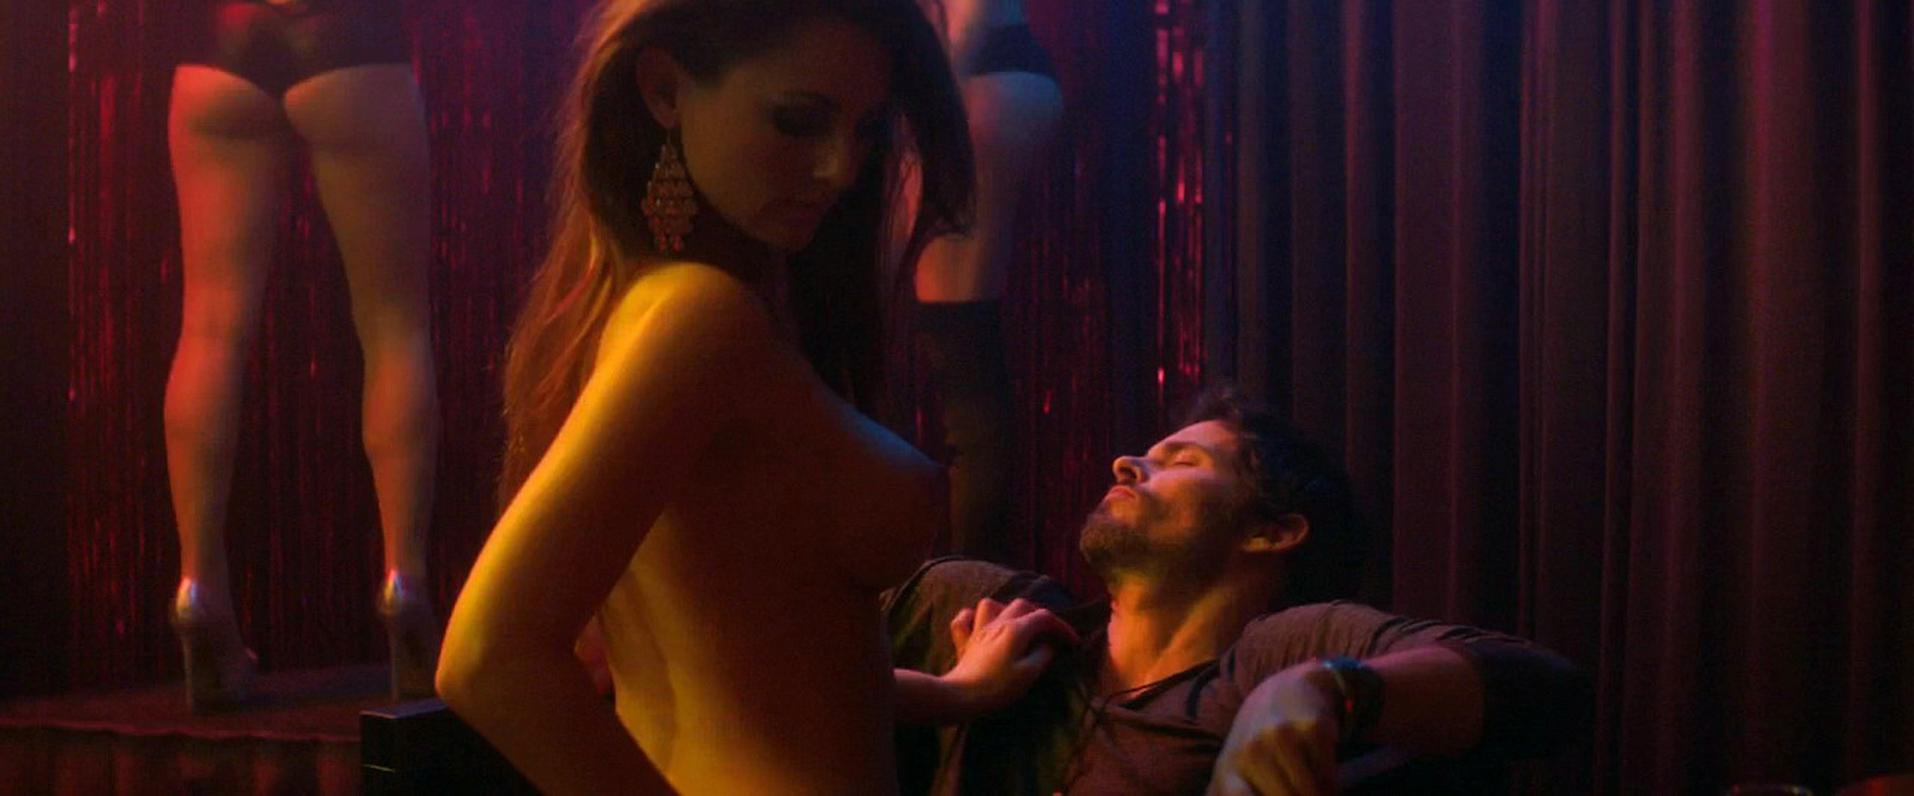 Daniella Short nude, Cynyon Dawn Rodriguez nude - The D Train (2015)